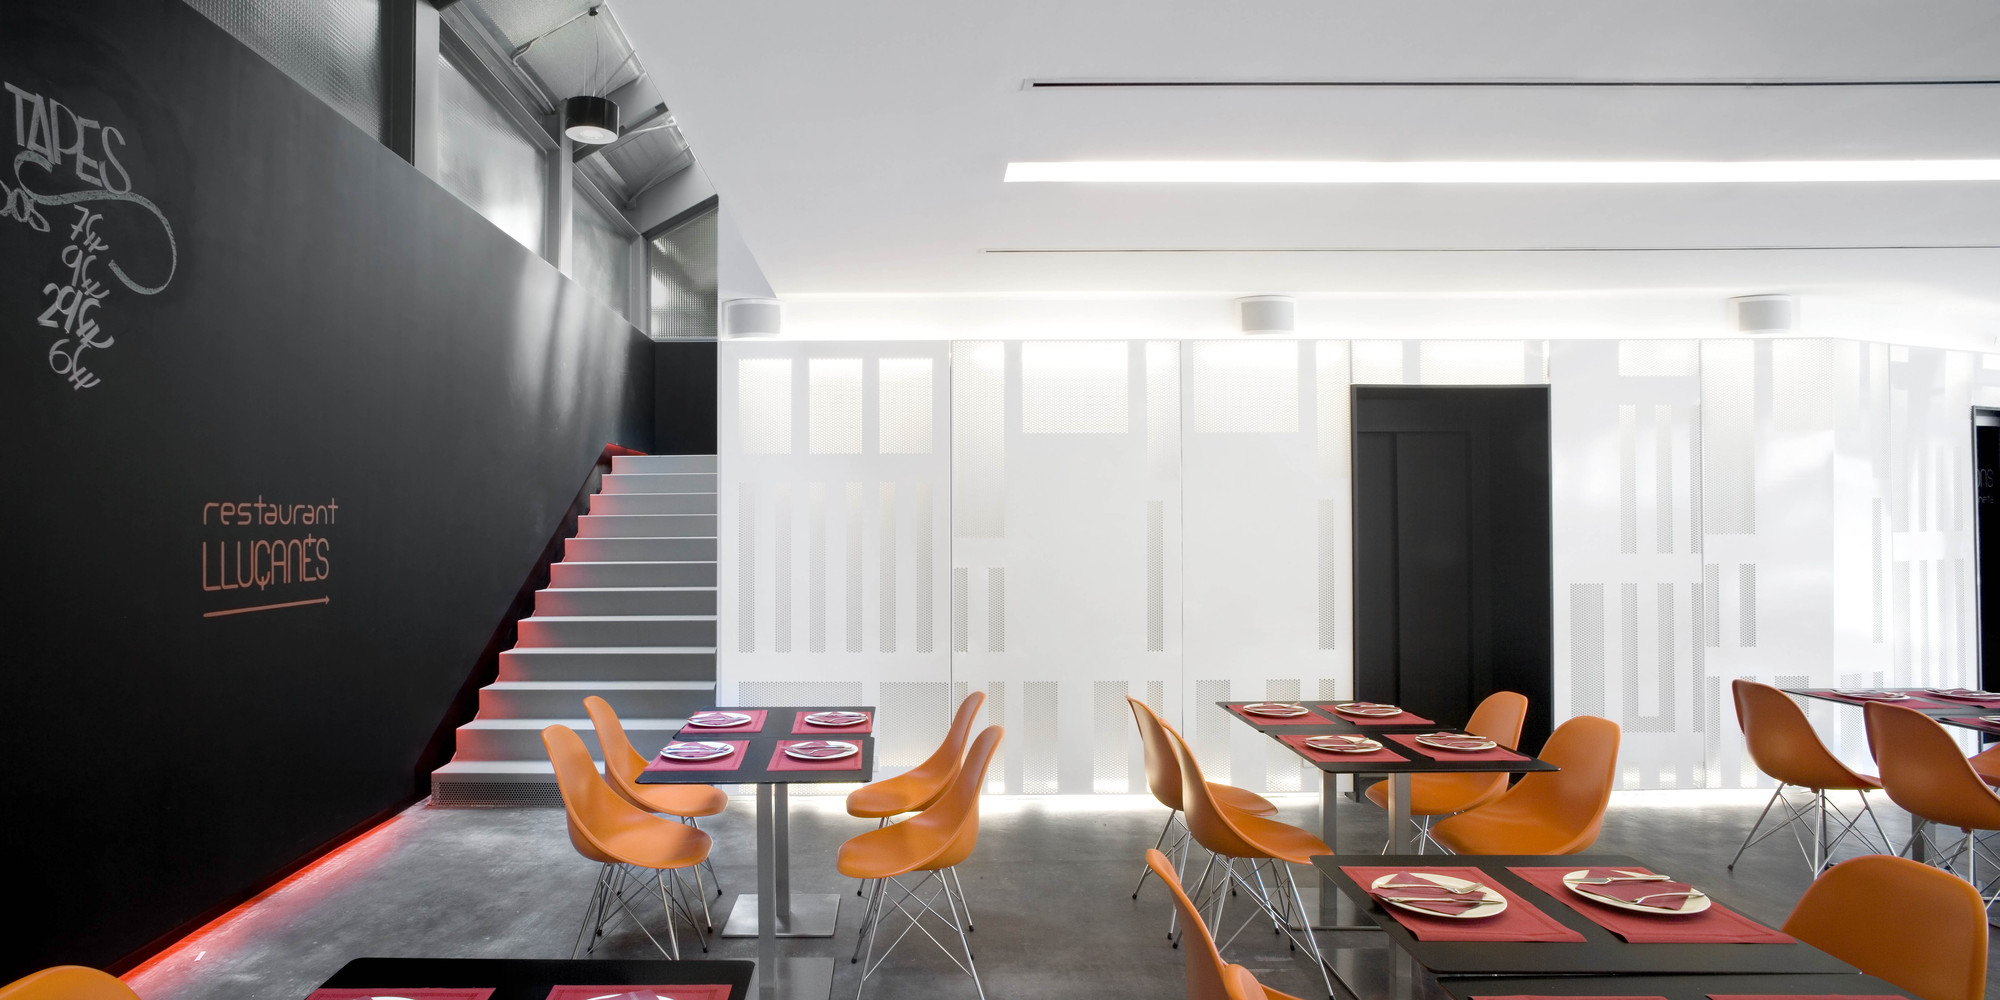 Restaurante Michelin / Josep Ferrando, © Adrià Goula